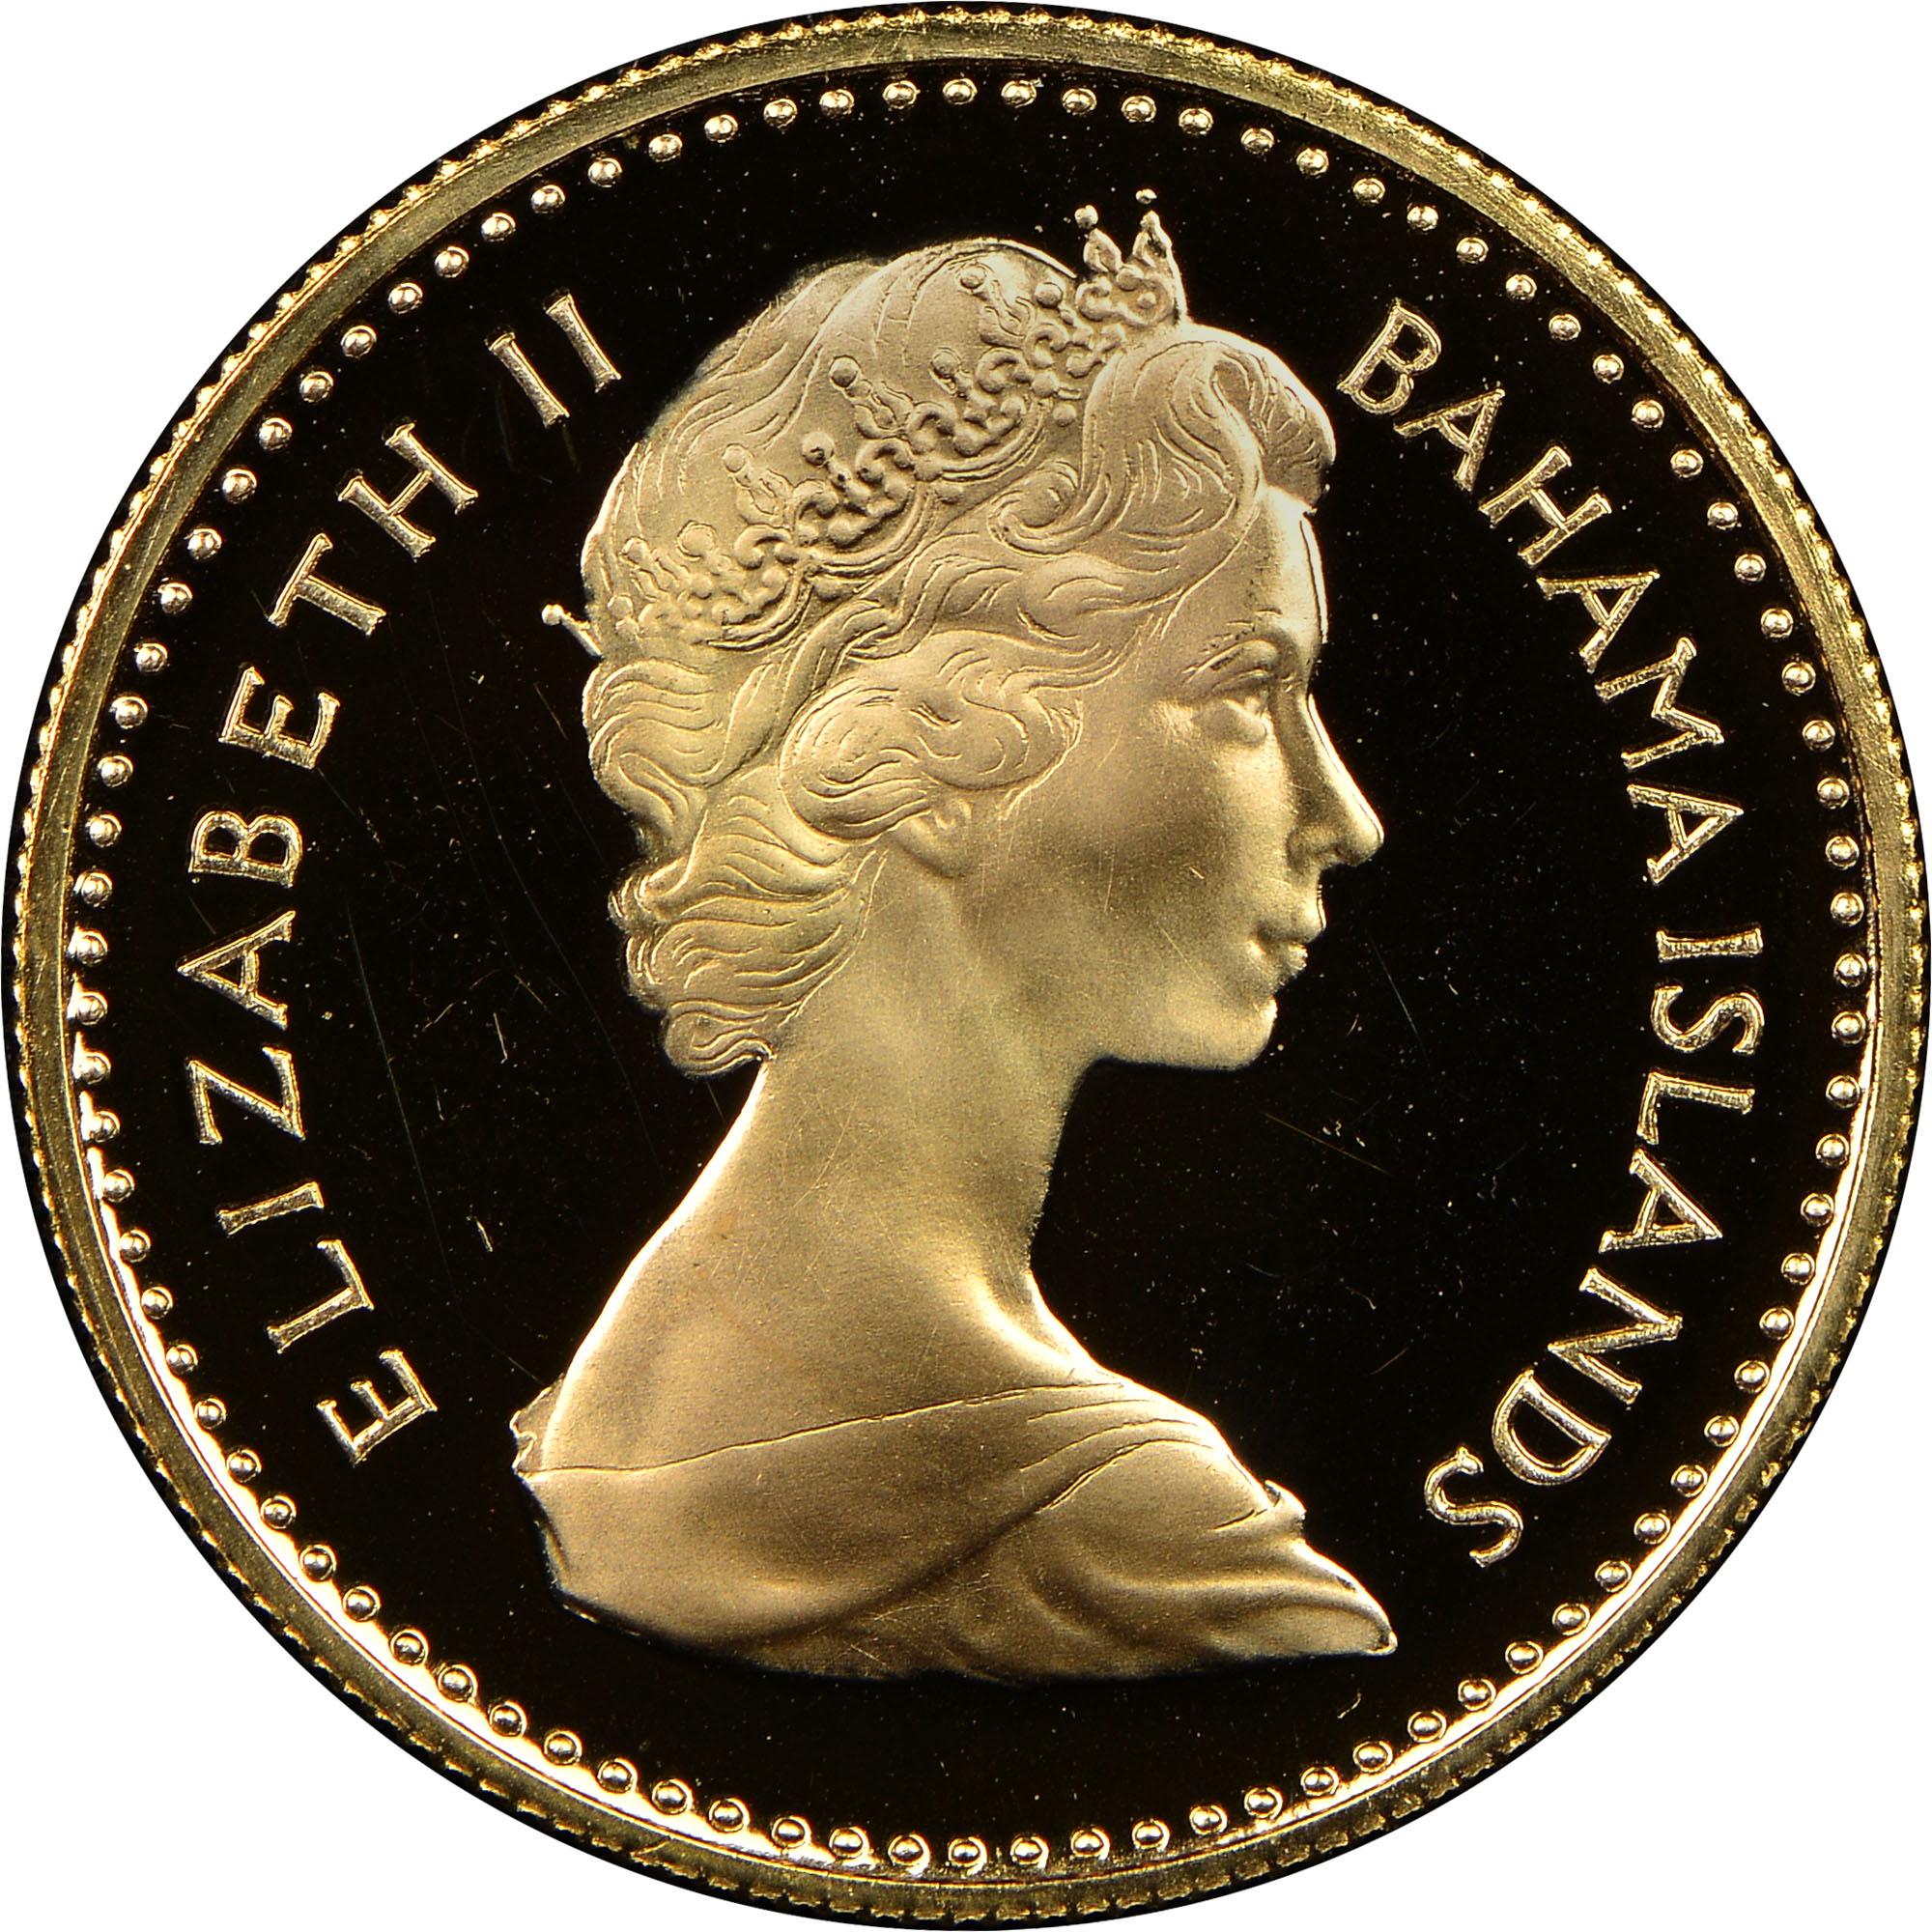 1967 Bahamas 10 Dollars obverse